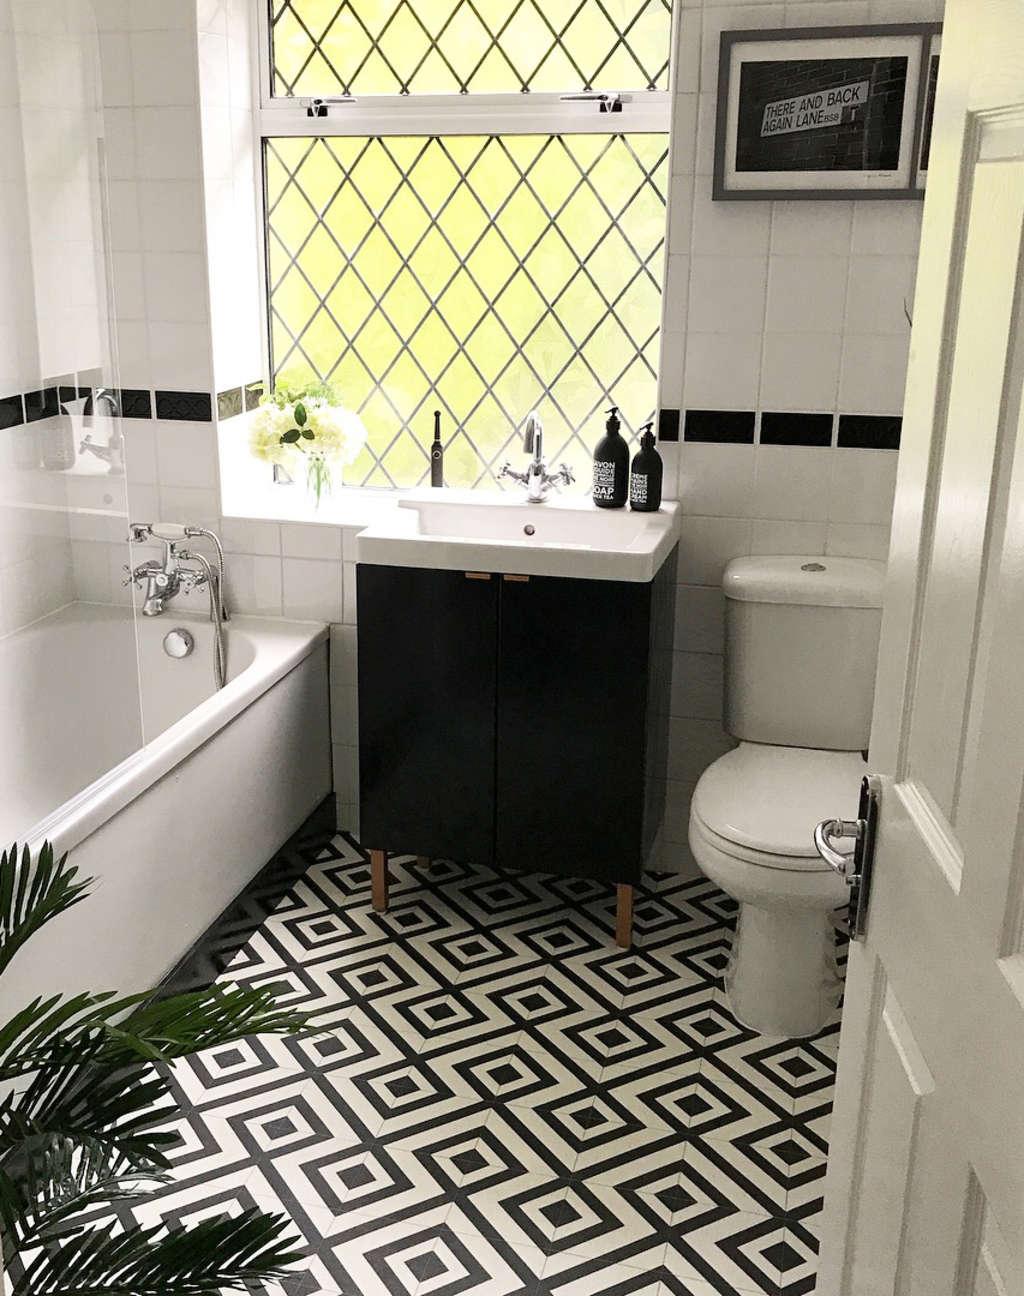 Truly Transformative Under $100 Bathroom Improvements